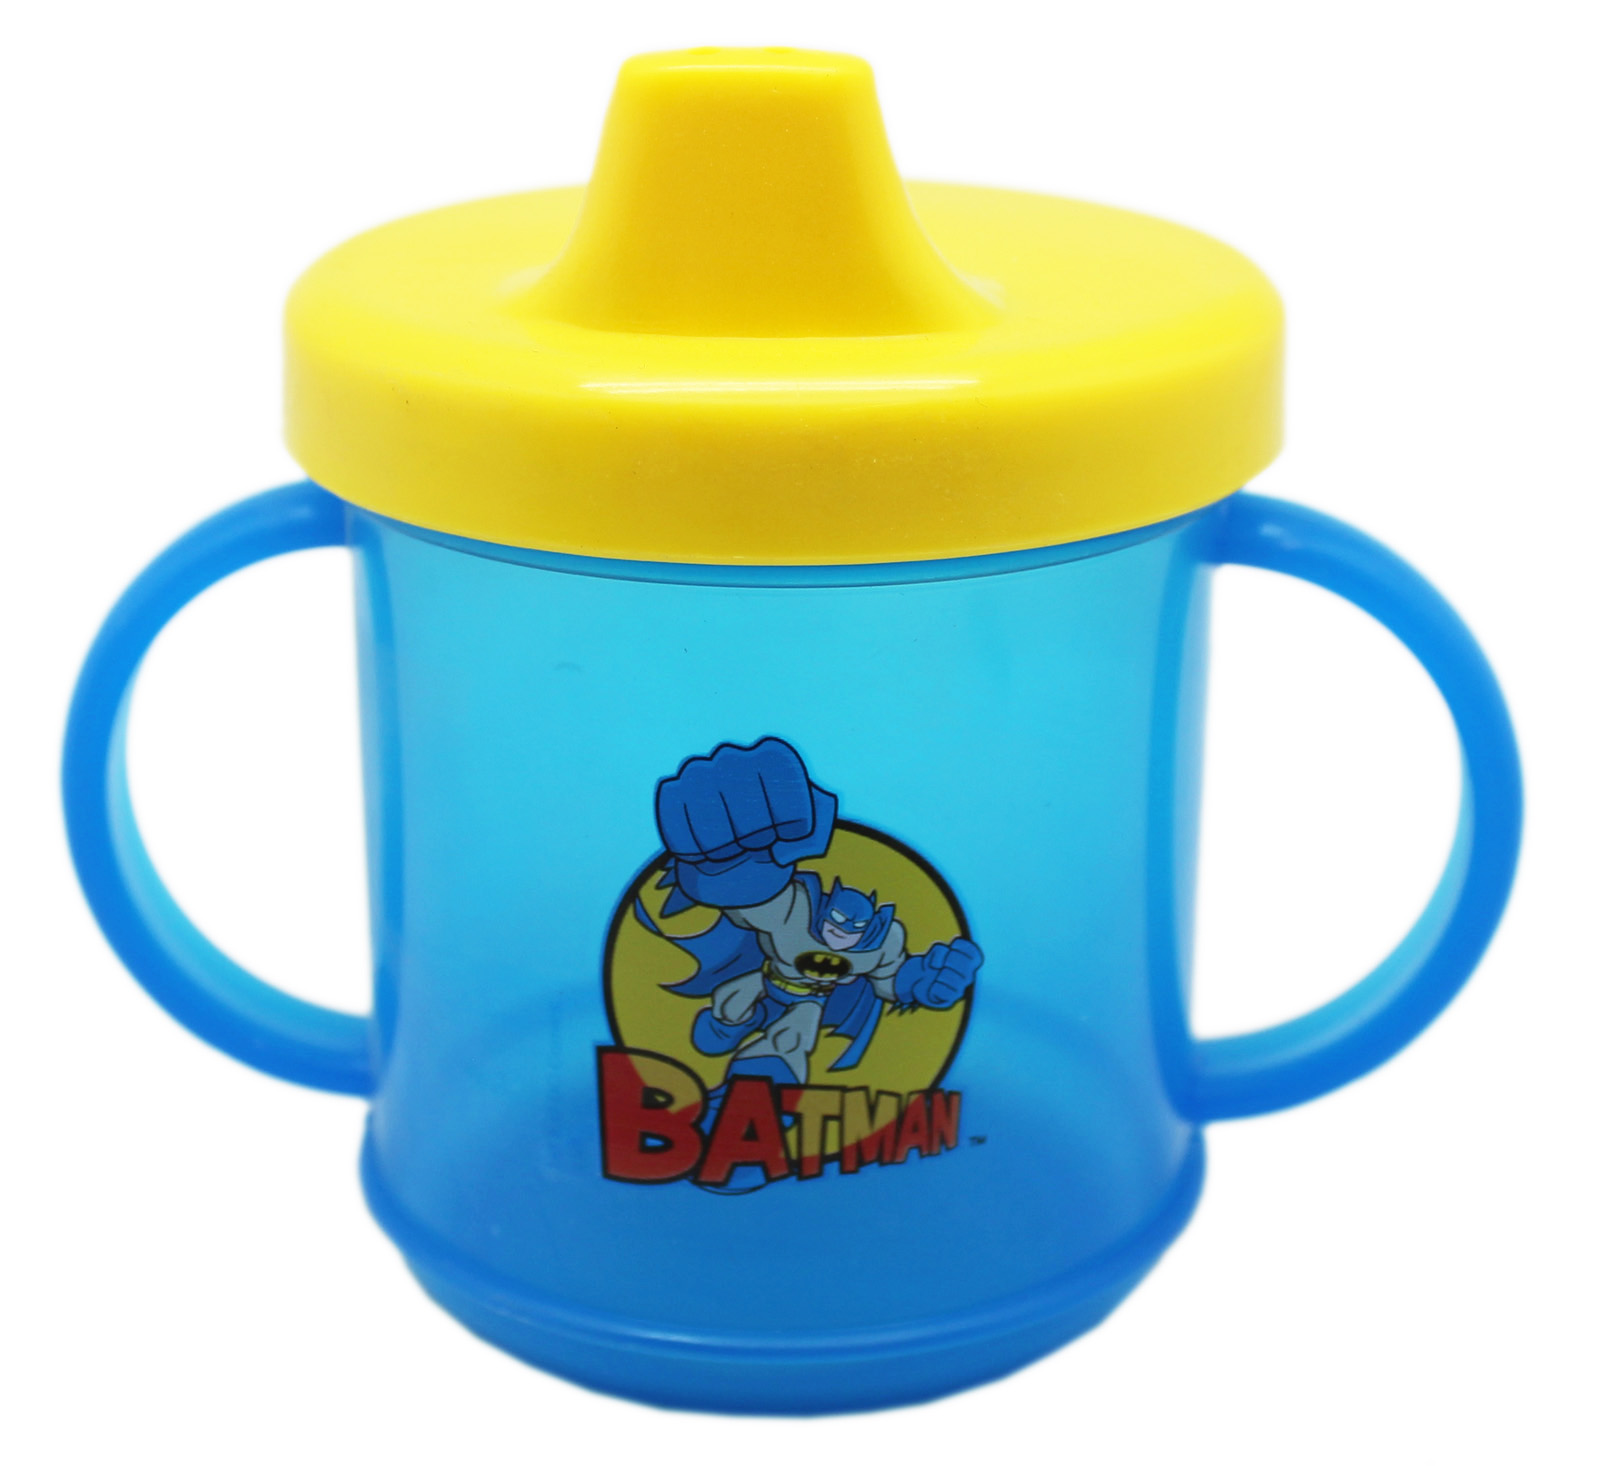 DC Super Friends Batman 2 Handle Sippy Cup (Blue/Yellow)